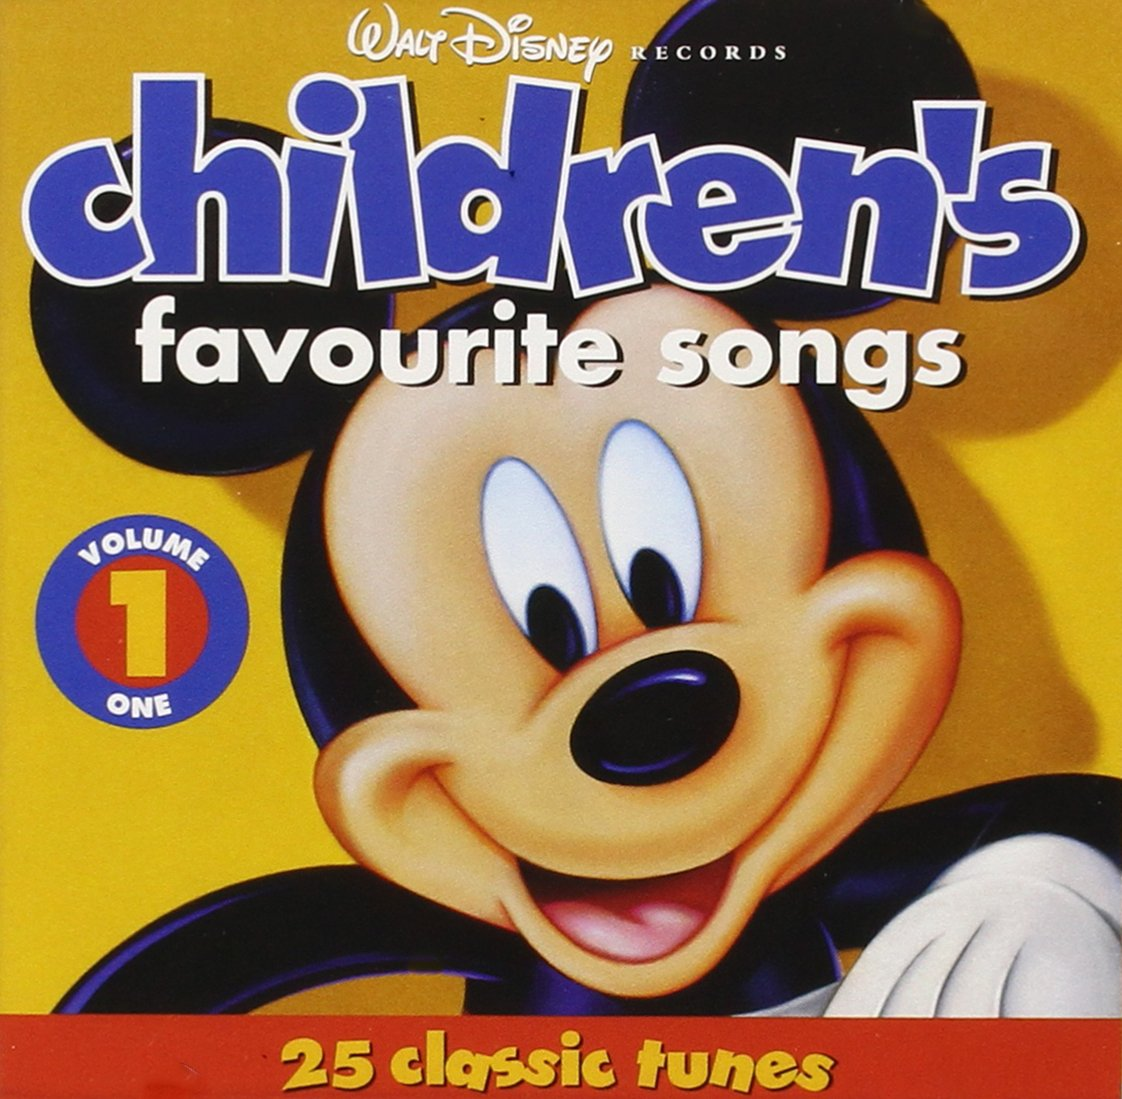 Disney Records Children's Favorite Songs (Vol. 1) by Walt Disney Records